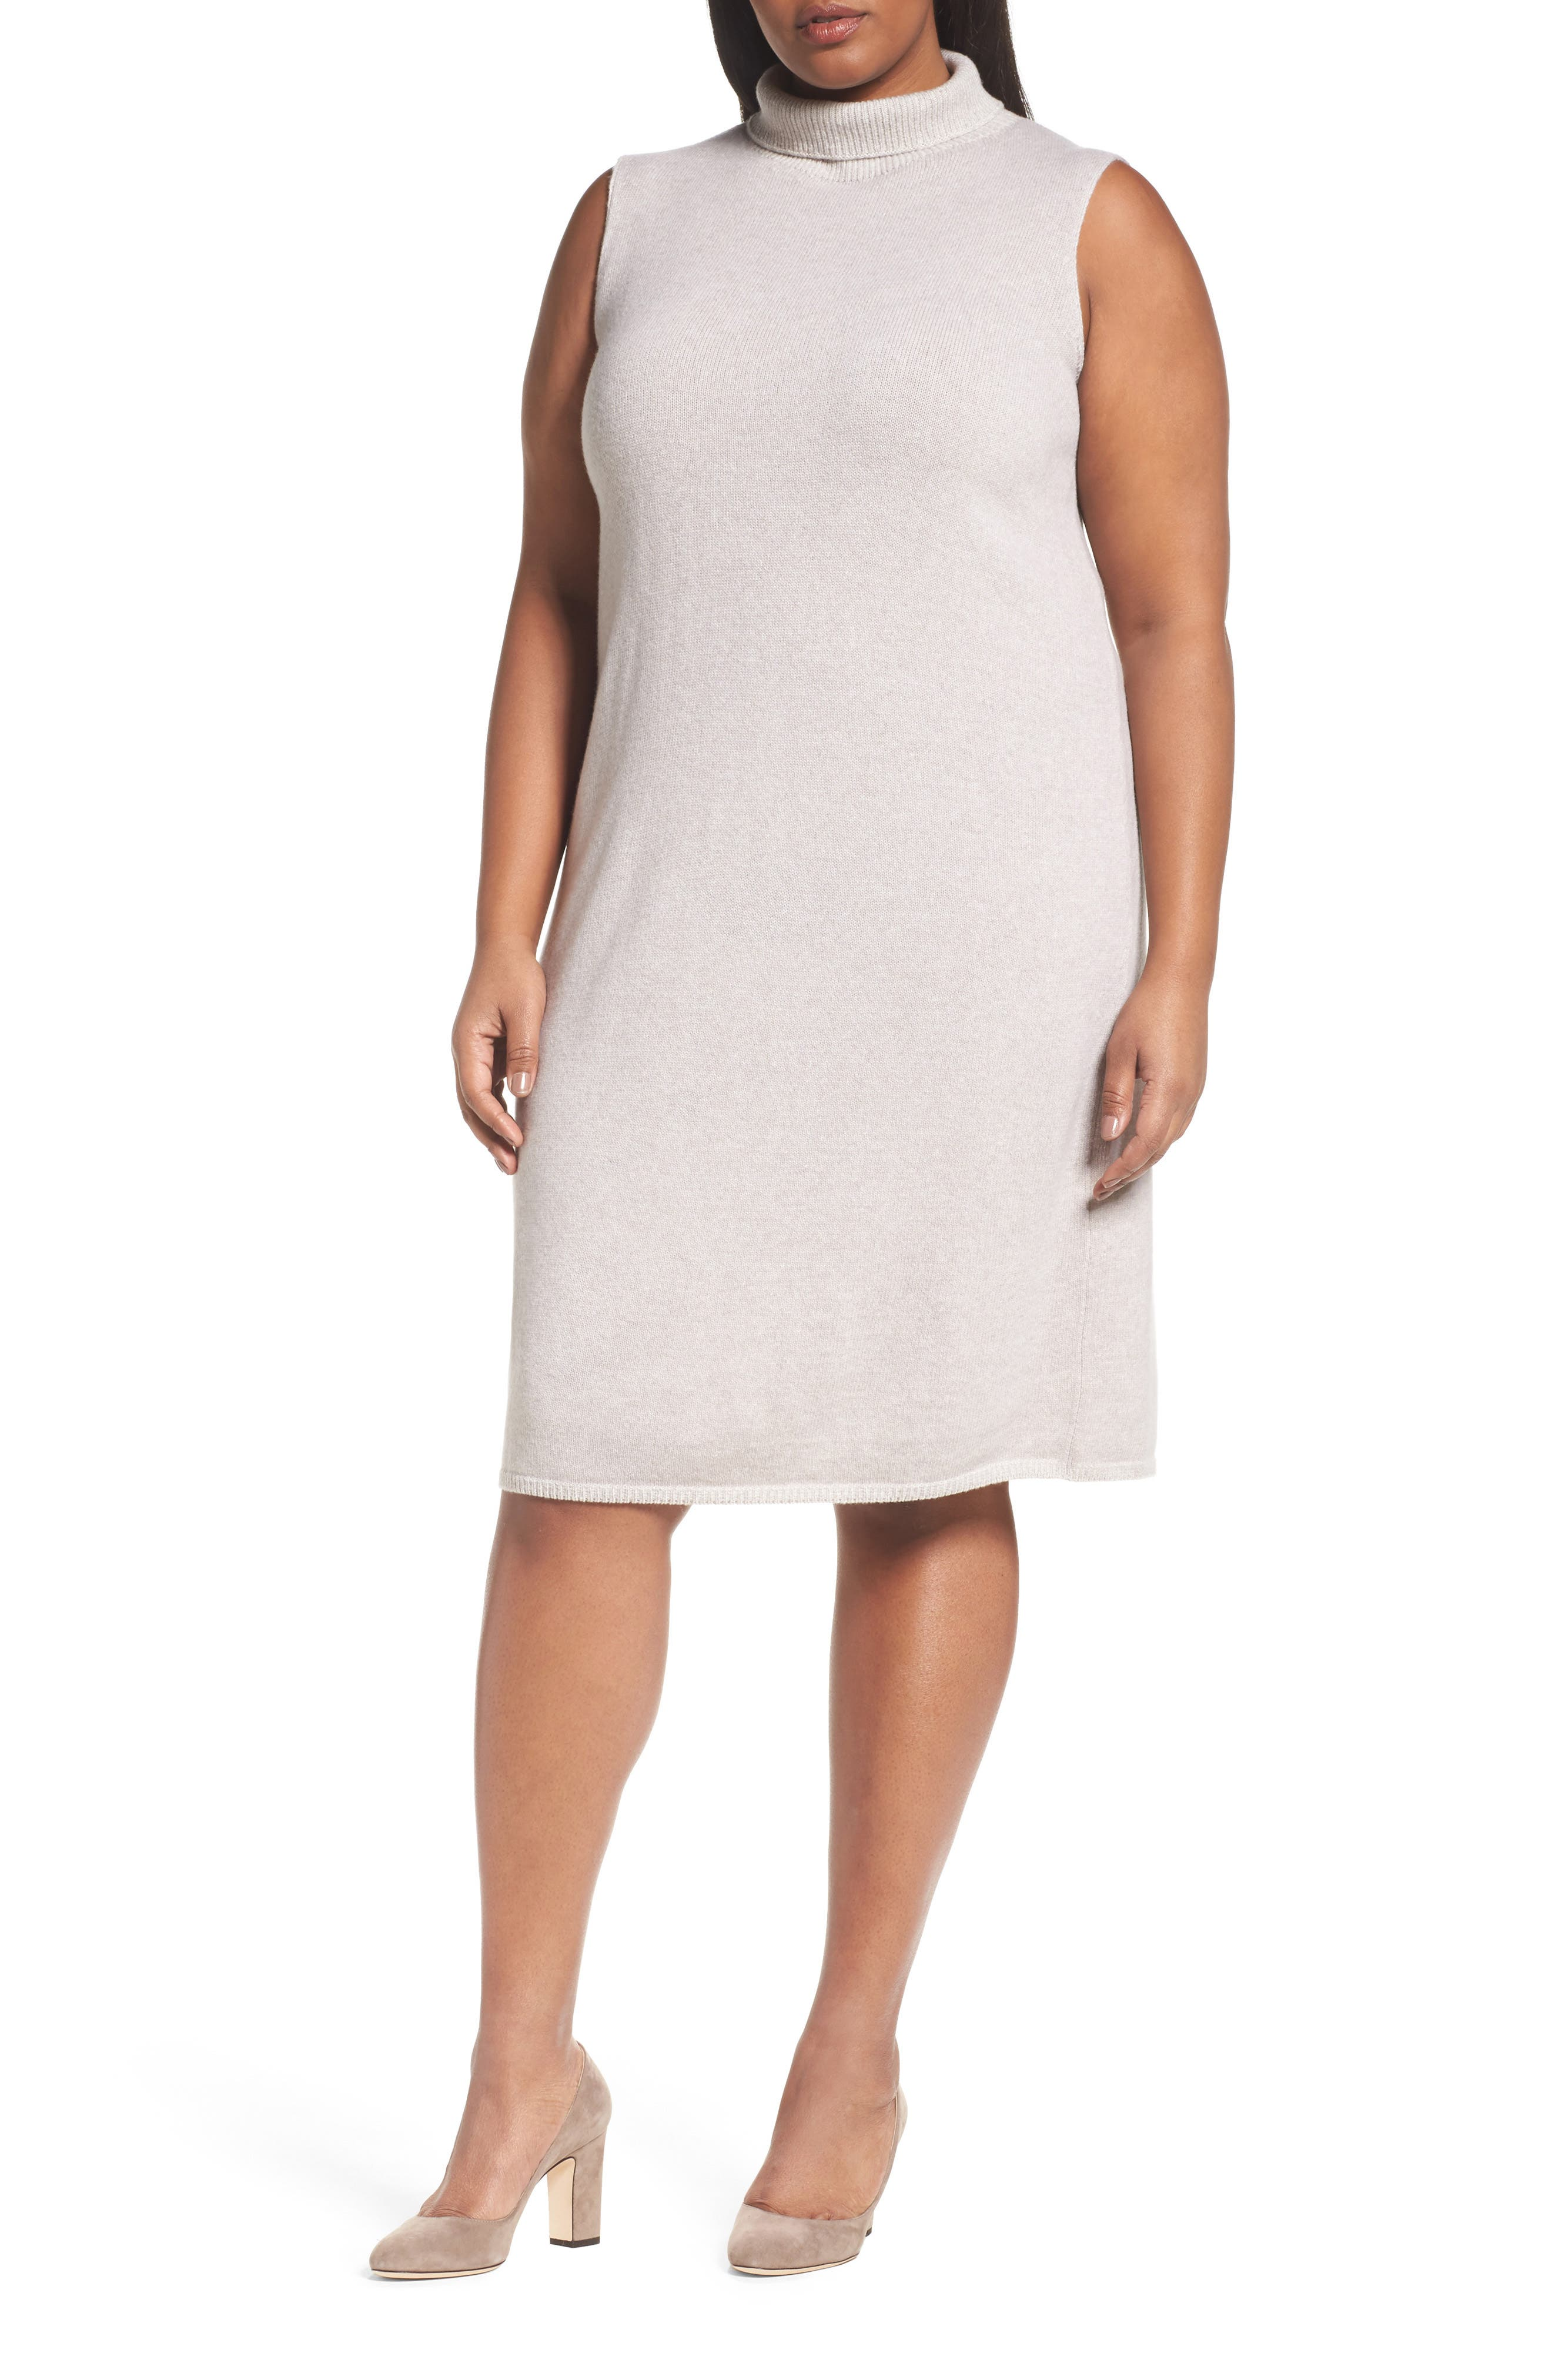 Vanise Merino Wool & Cashmere Sweater Dress,                         Main,                         color, Luxor/ Cloud